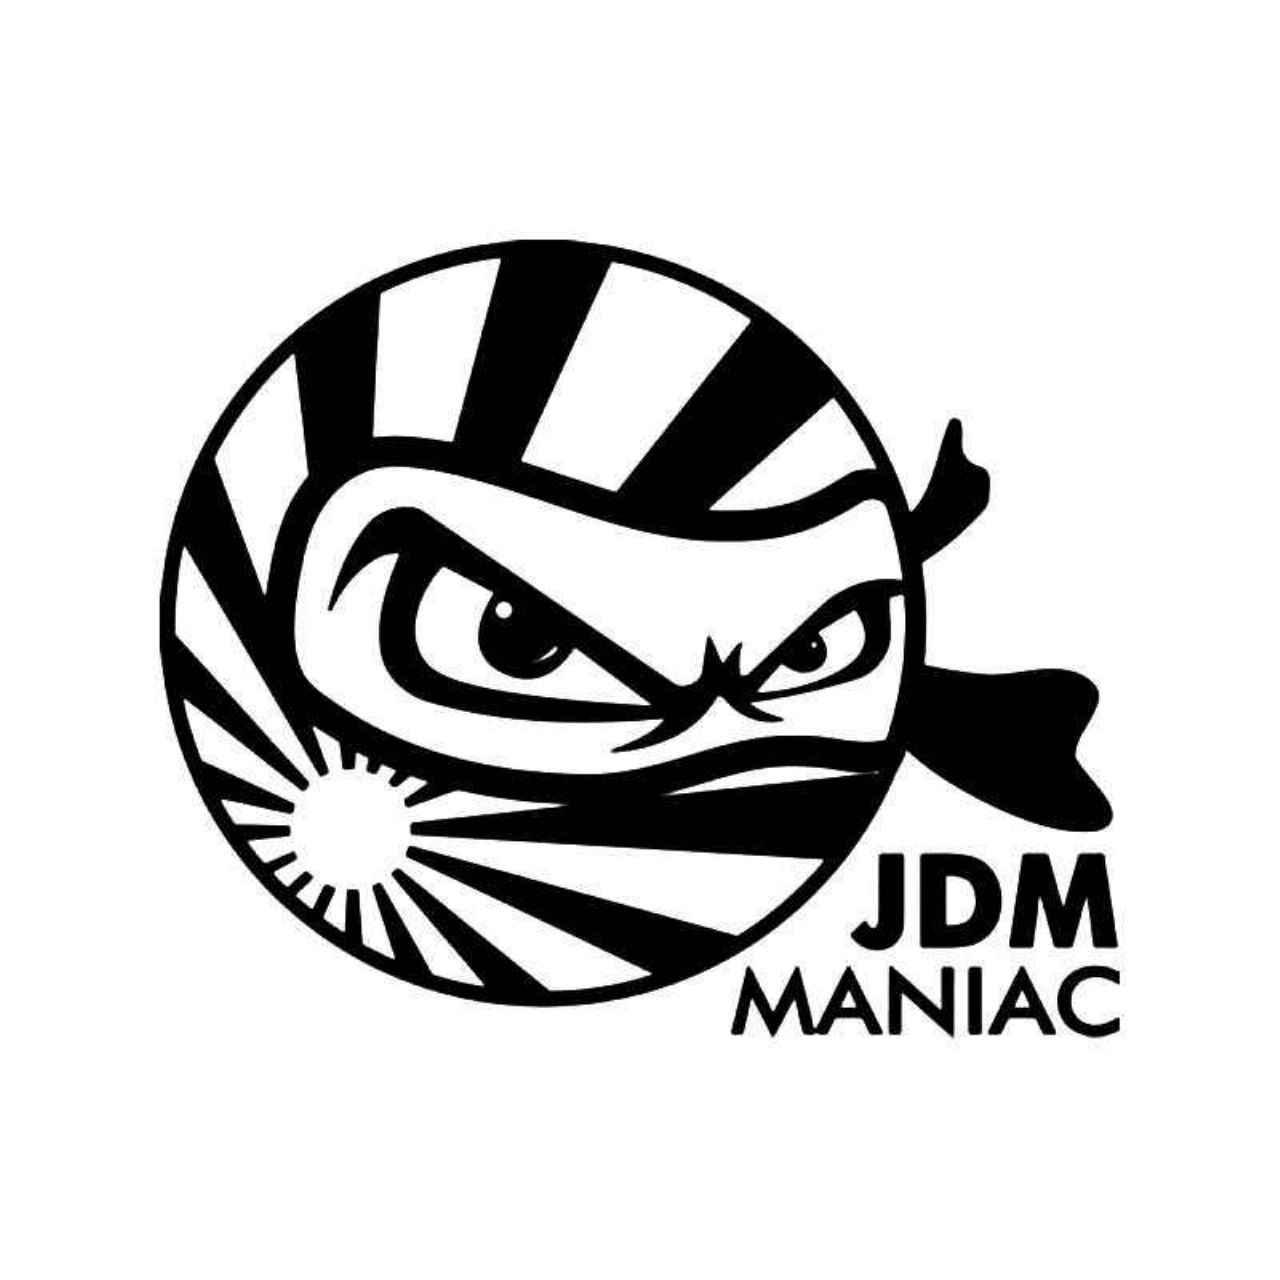 1280x1280 Maniac Ninja Rising Sun Japanese Vinyl Decal Sticker